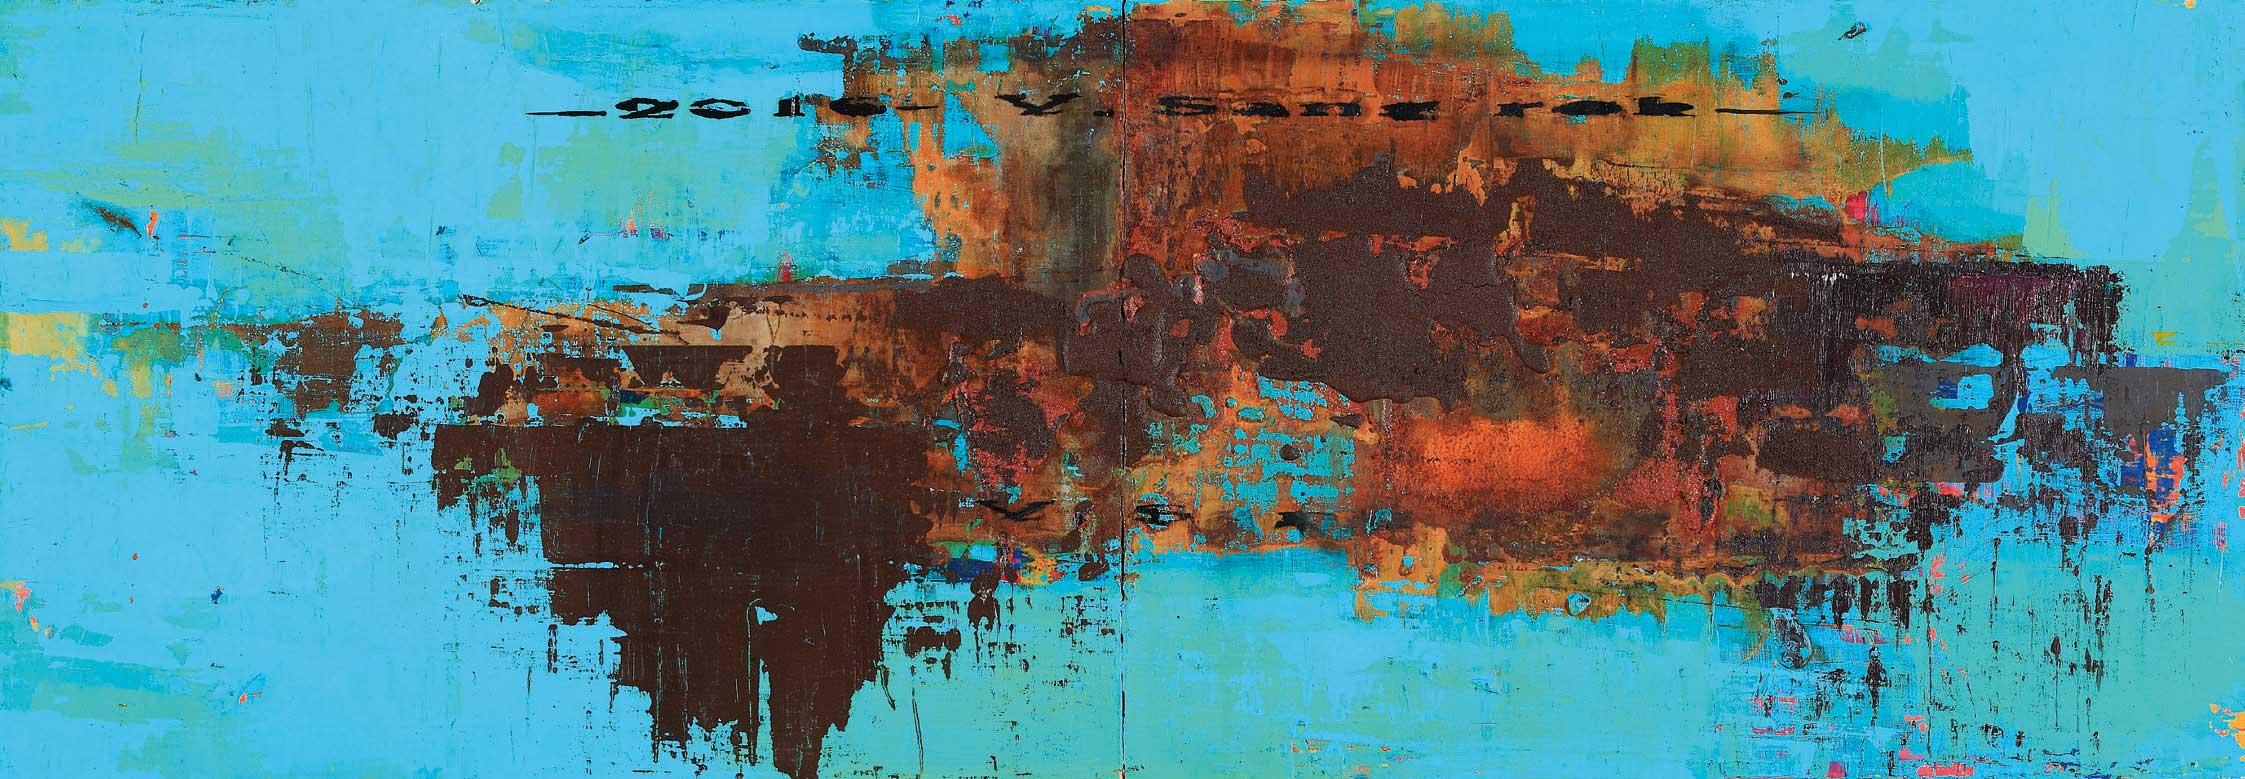 The Memory, 90 x 35 cm, 아크릴, 유화 및 혼합재료, 2017 (2)